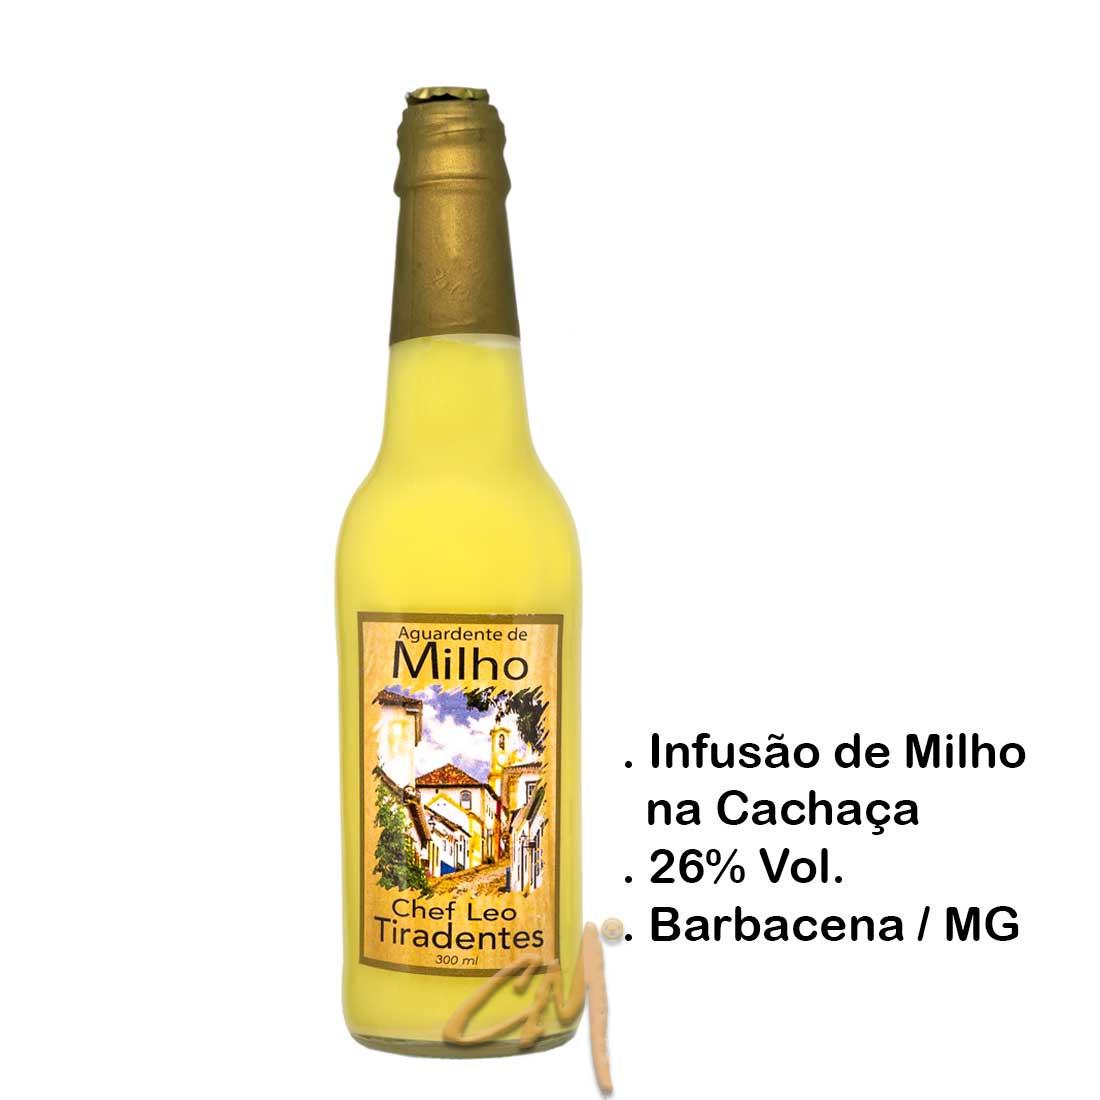 Infusão Milho Chef Leo 300 ml (Barbacena - MG)